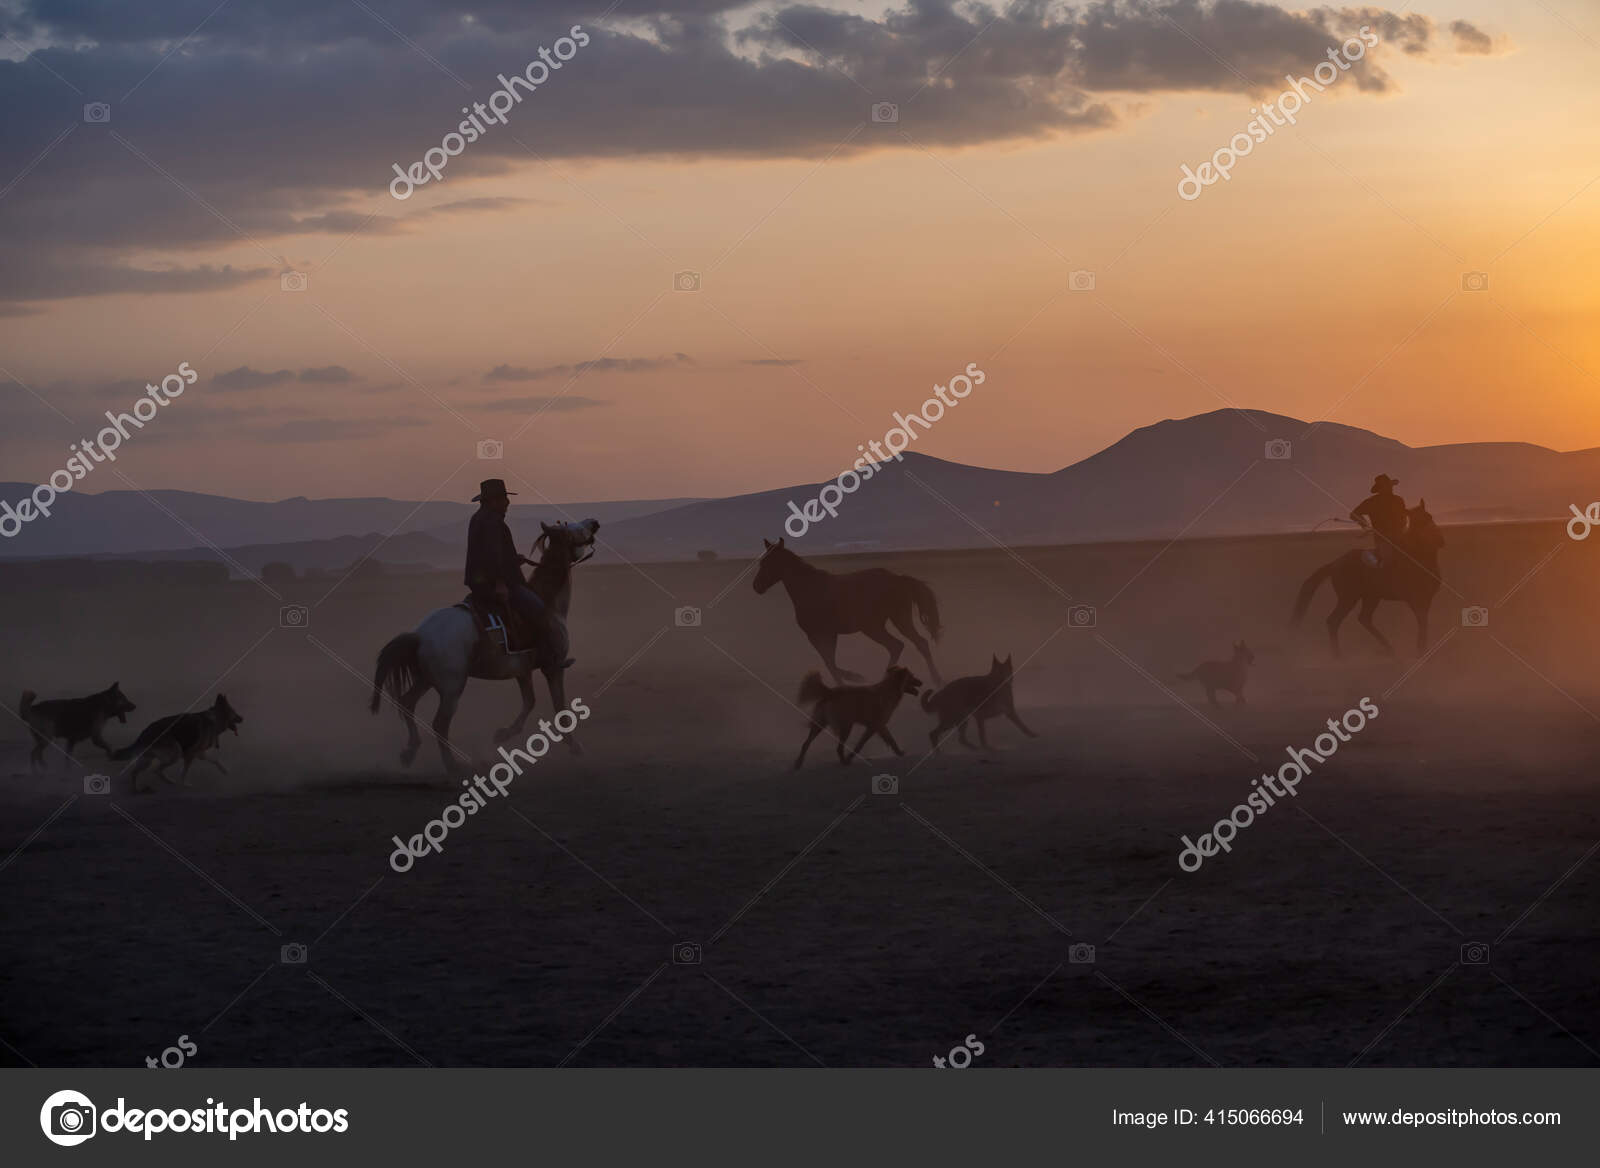 Wild Horses Run Foggy Sunset Wild Horses Running Dust Hormetci Stock Photo C Attractionart 415066694